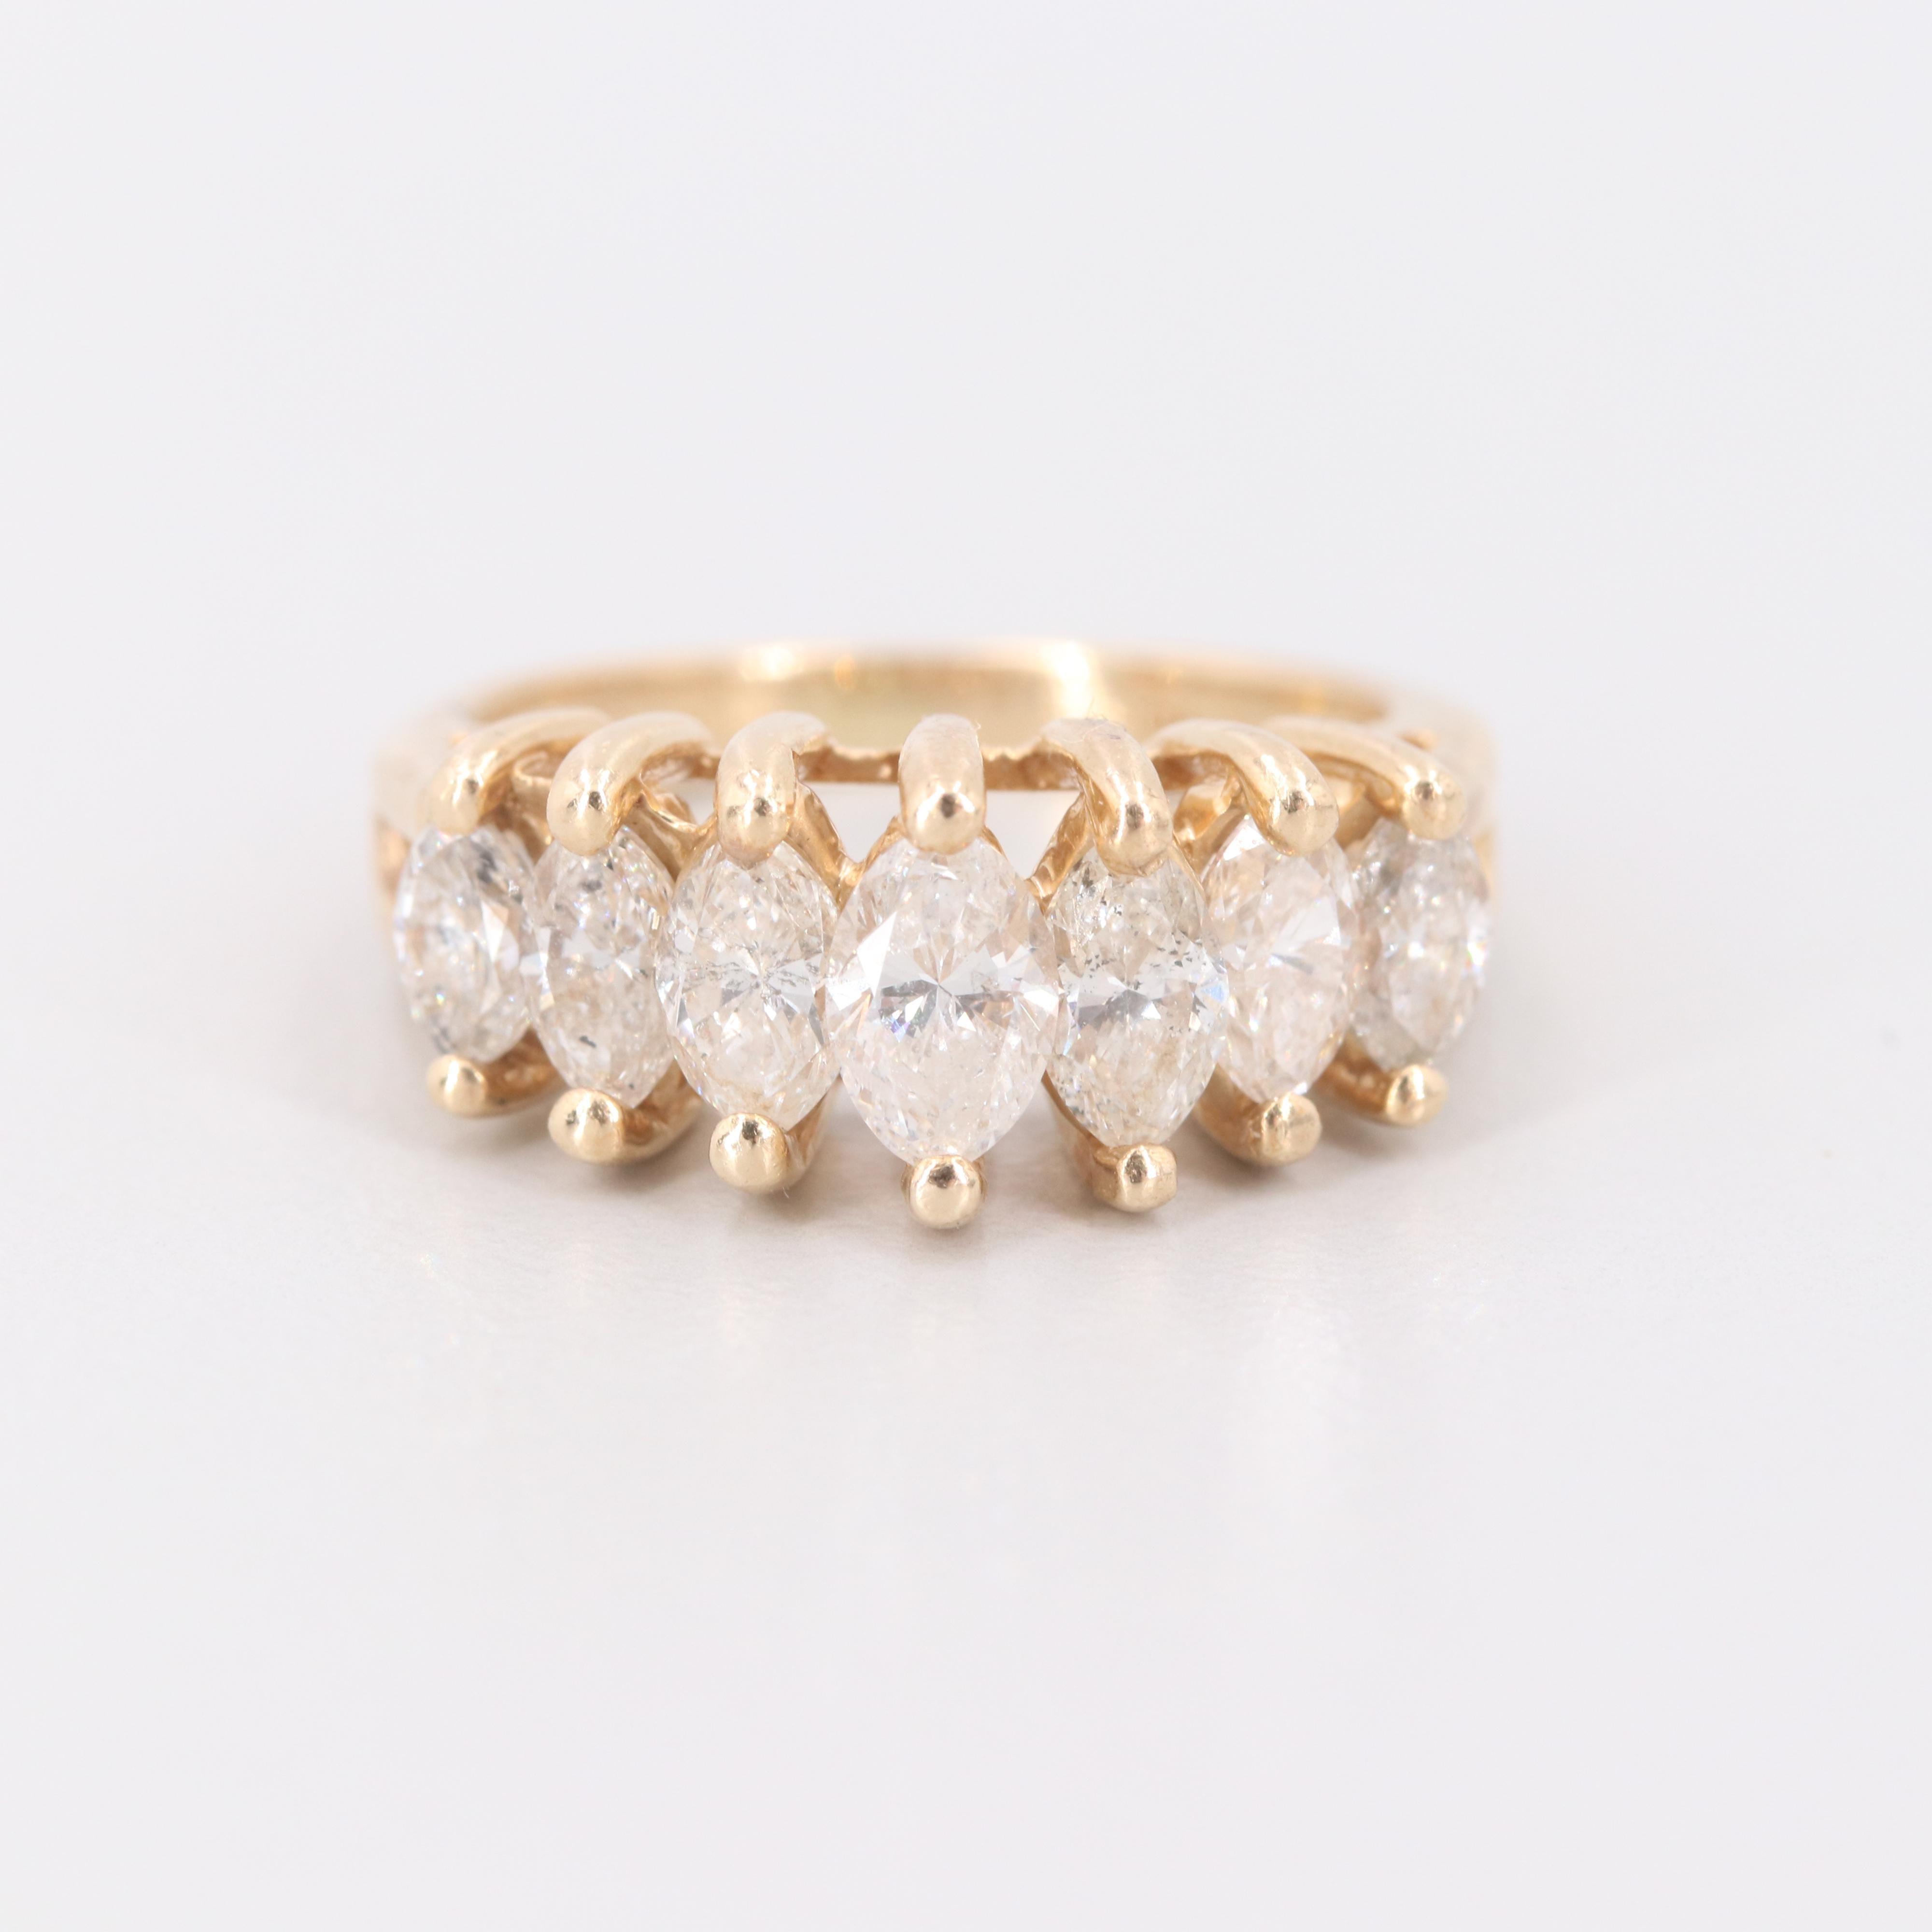 14K Yellow Gold 2.03 CTW Diamond Ring